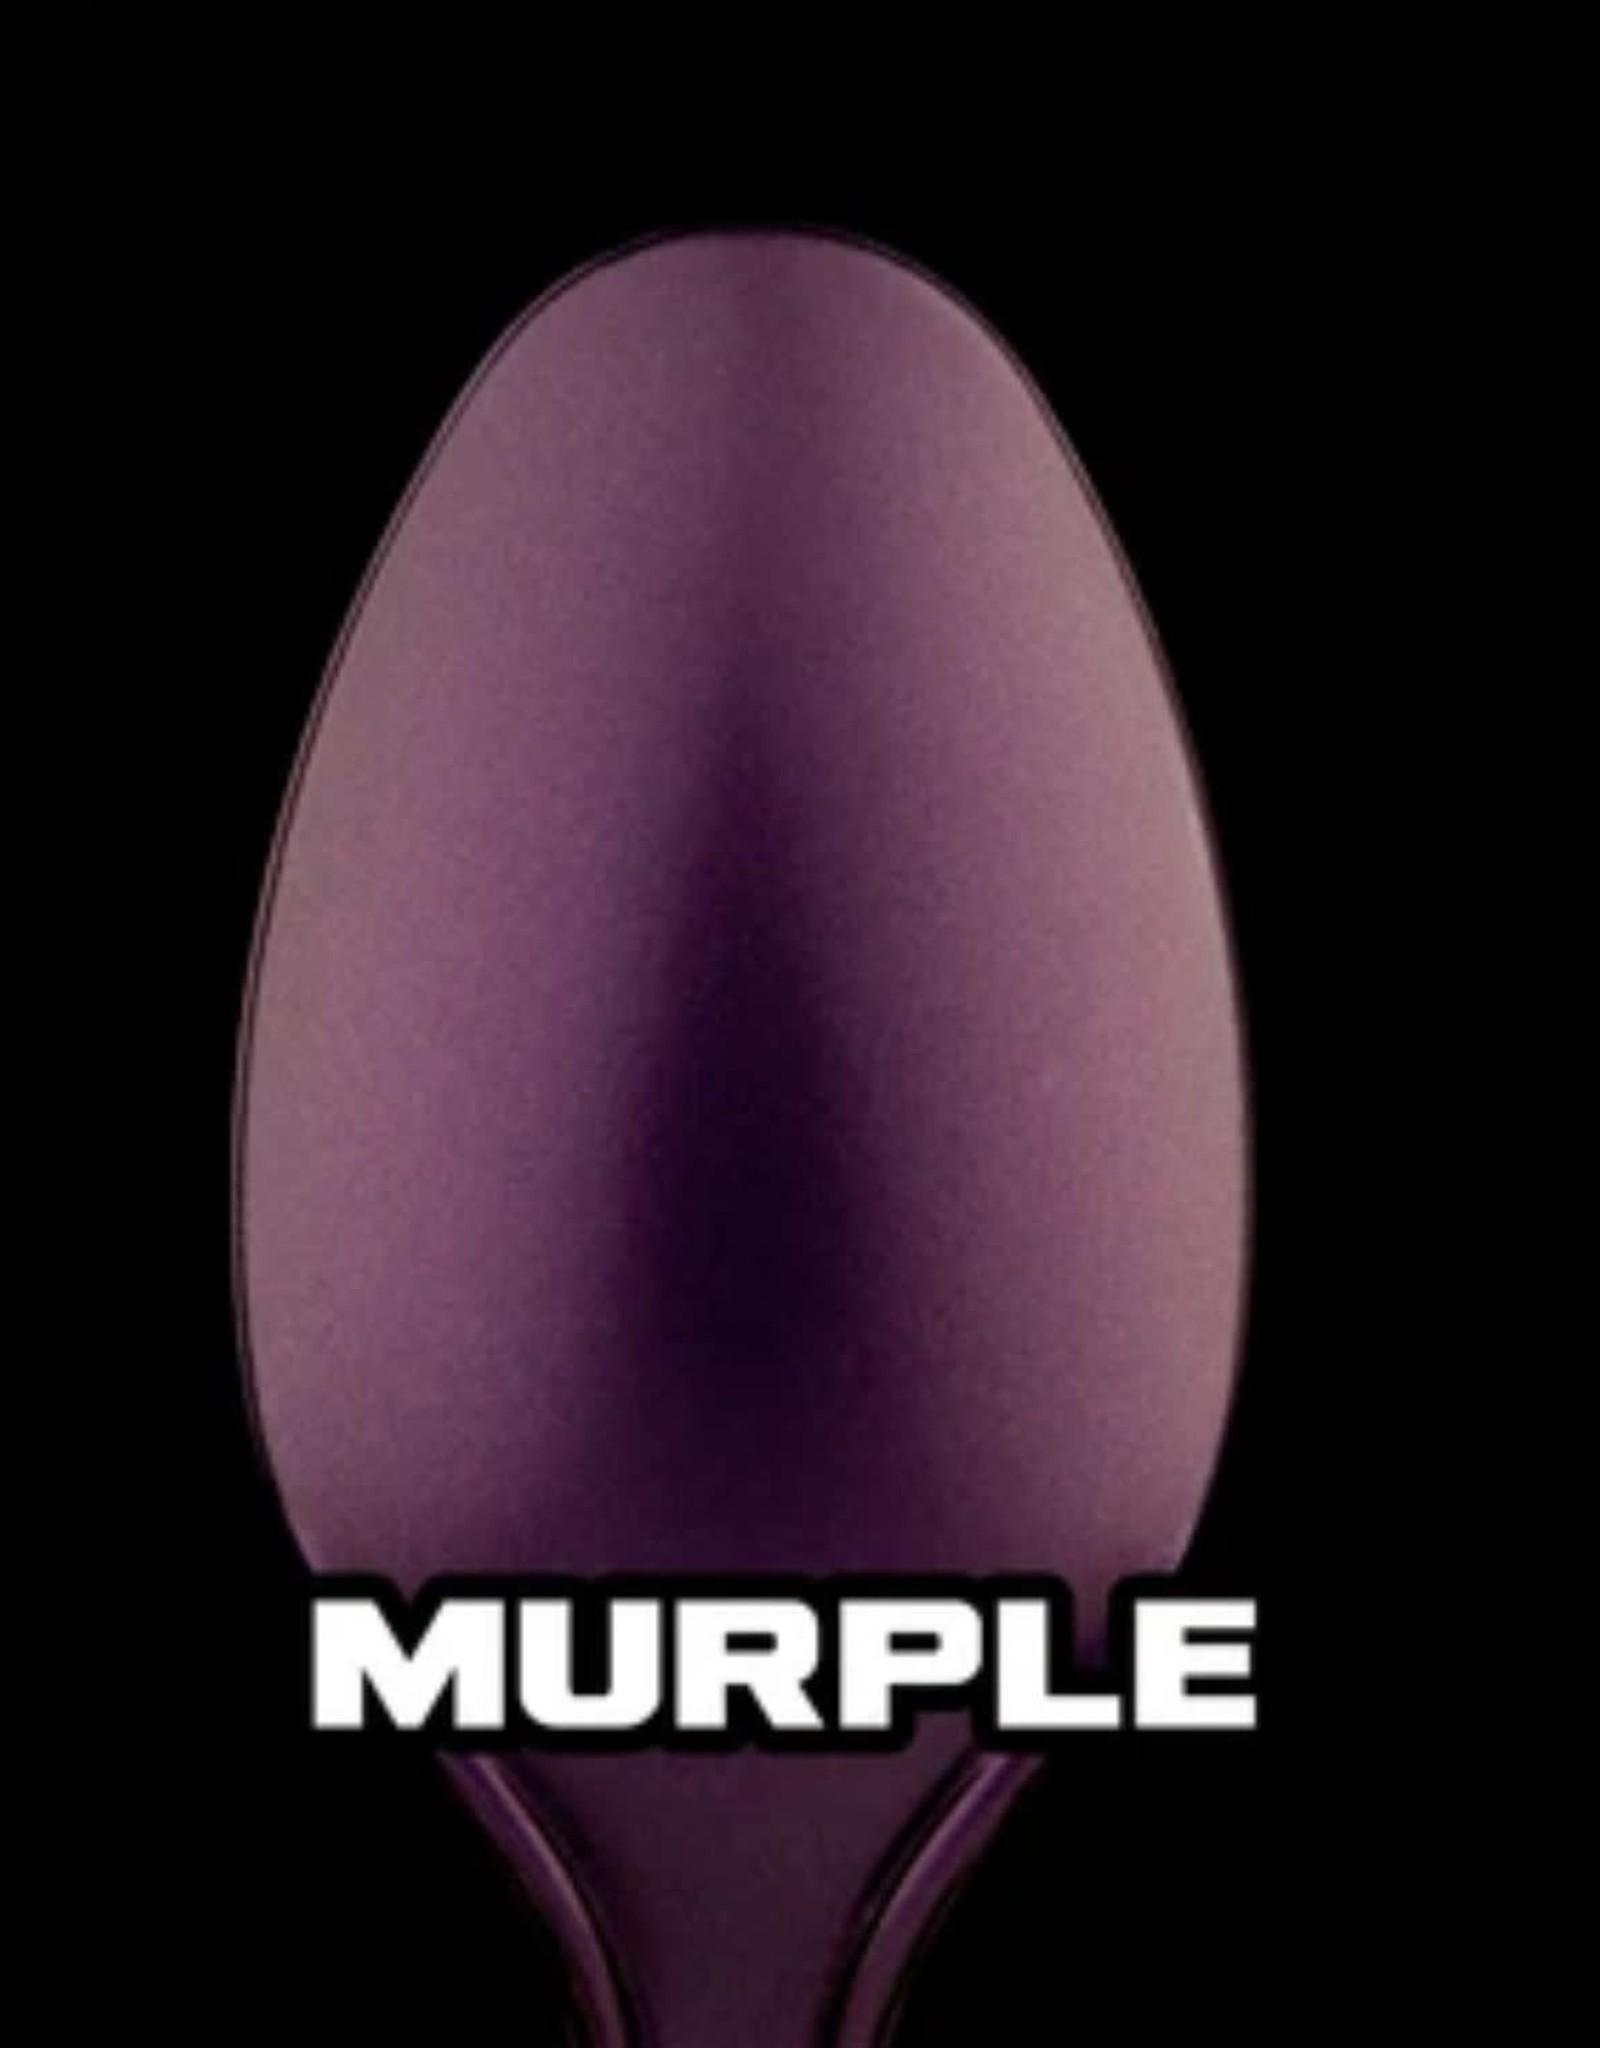 Turbo Dork Murple - Metallic